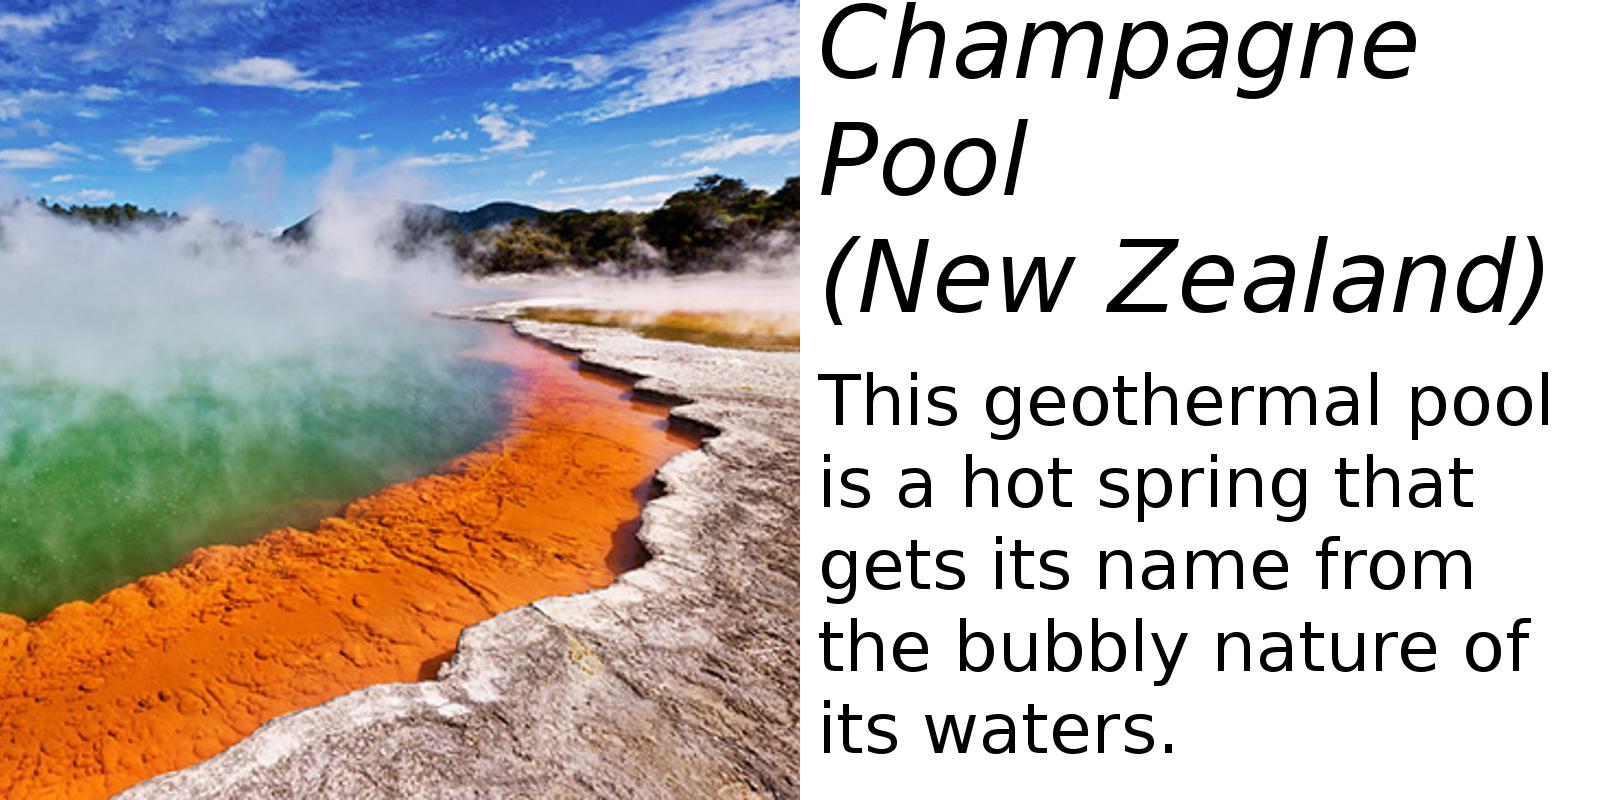 Champagne Pool, New Zealand (description) #2